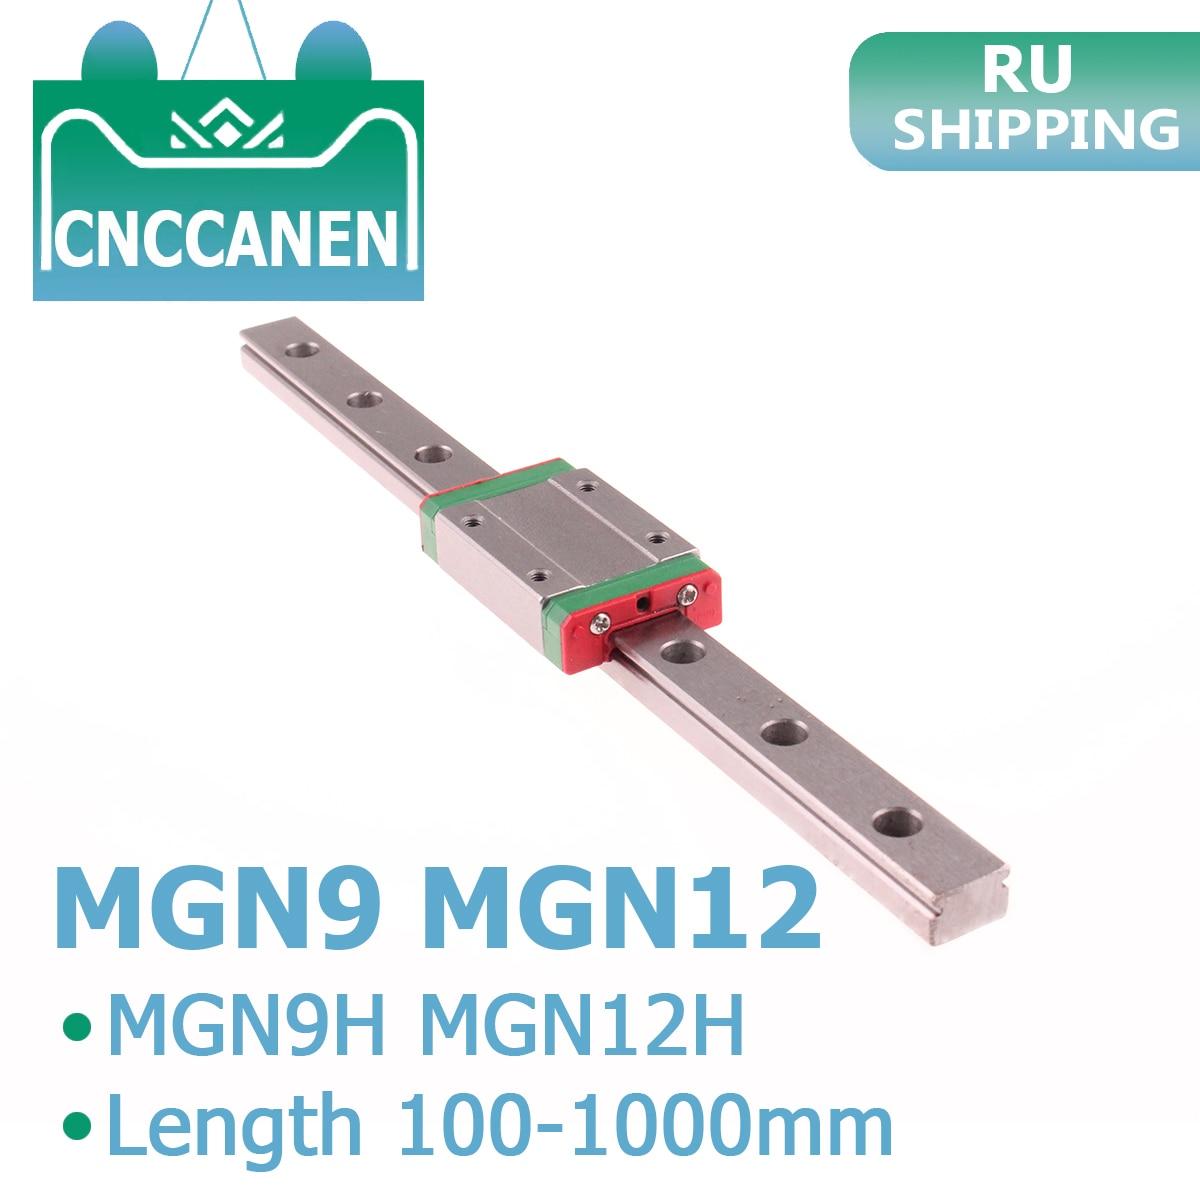 CNC 3D Printer MGN9 MGN12 100mm - 1000mm 300 600mm Miniature Linear Rail Slide 1PCS MGN Linear Guide MGN9H Carriage MGN12H Block